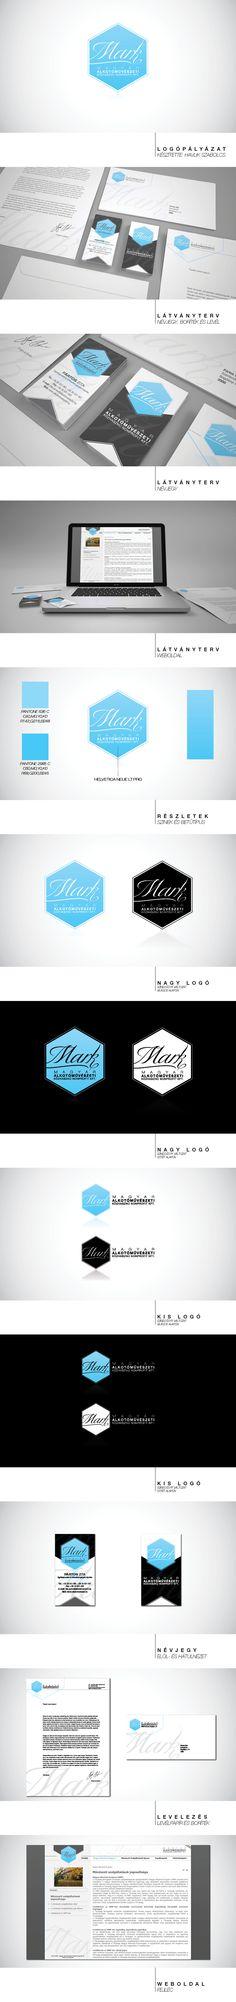 MANK, branding, arculati pályázat, logo